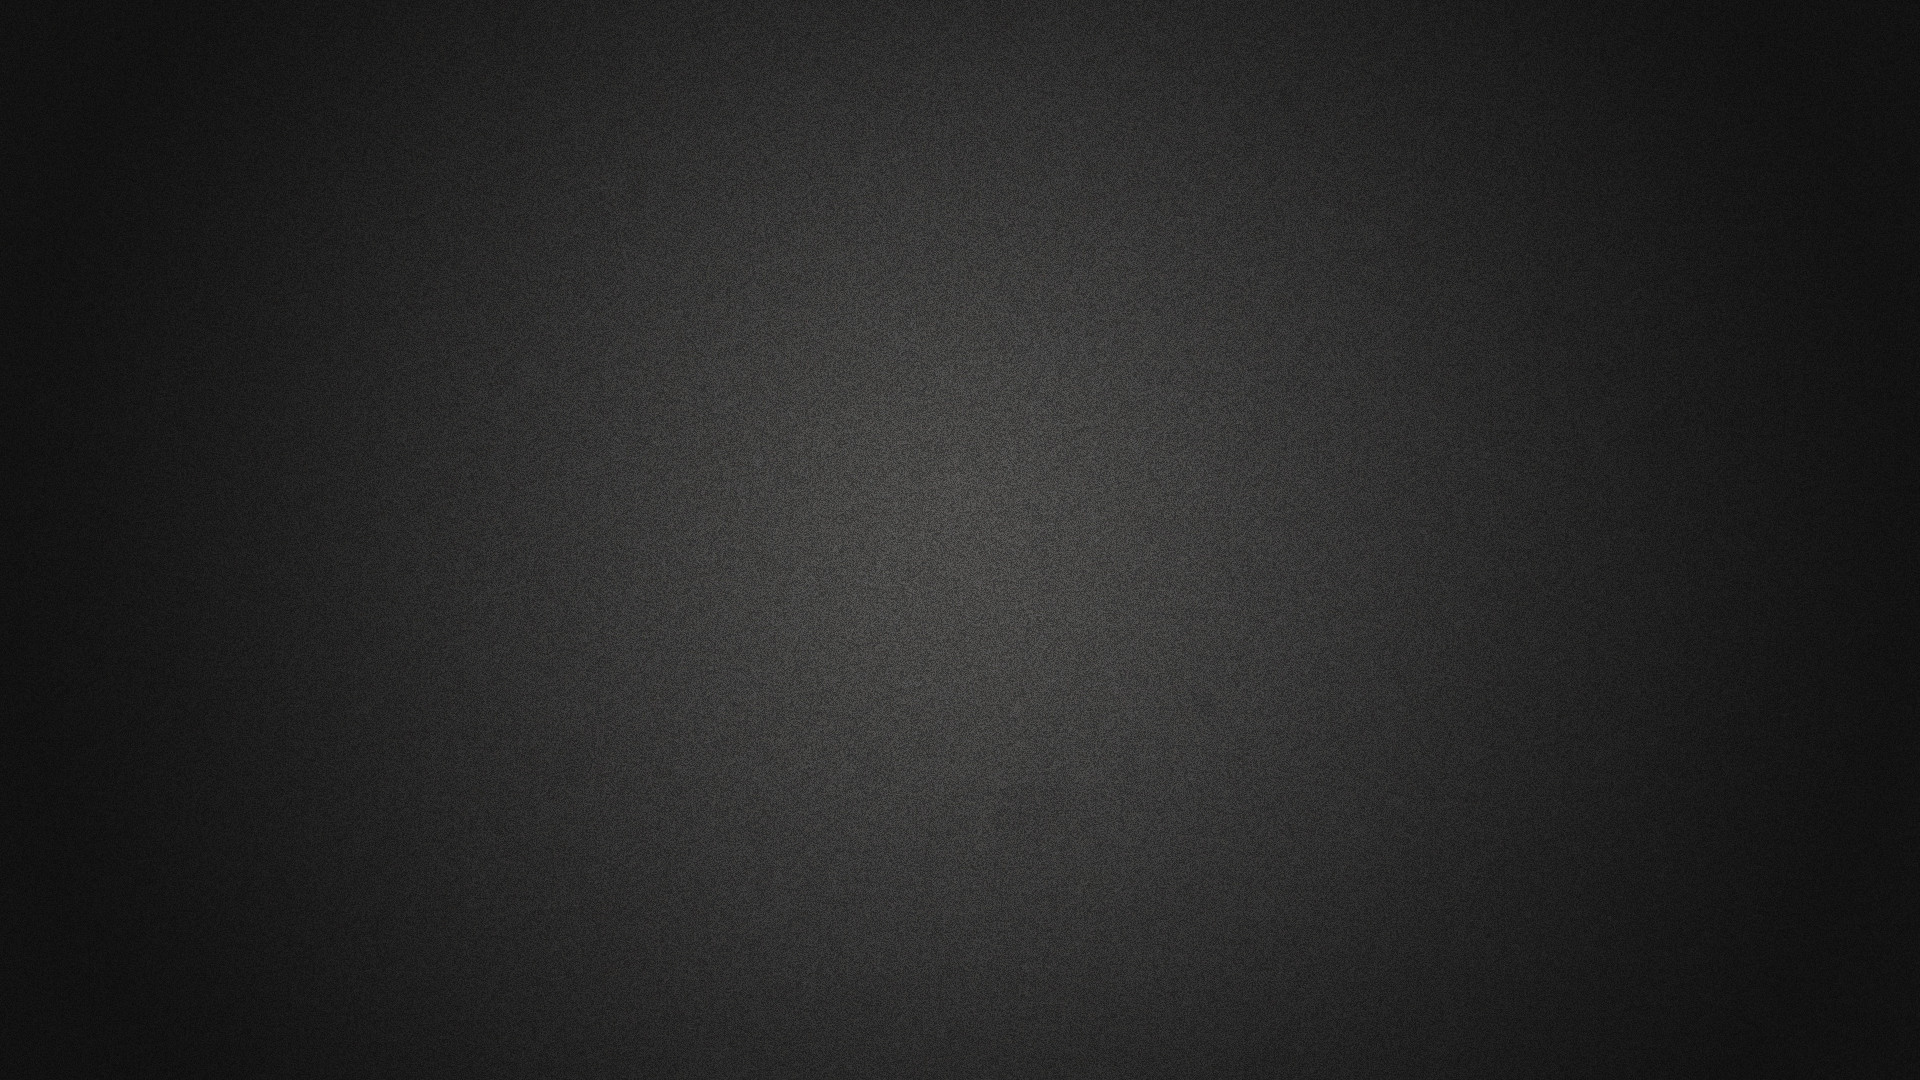 Matte Black Wallpaper 67 Pictures